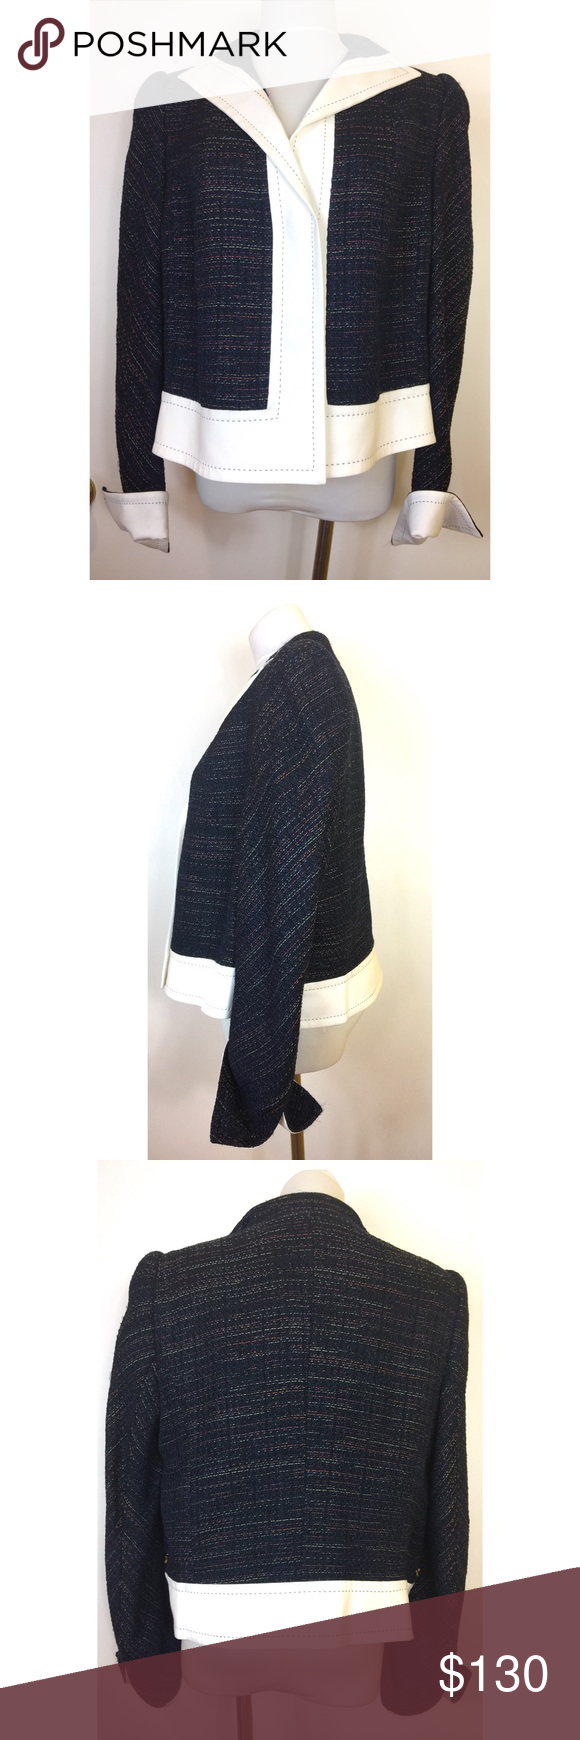 ESCADA Tweed Blazer Jacket Size 44 Large Navy Blue Escada